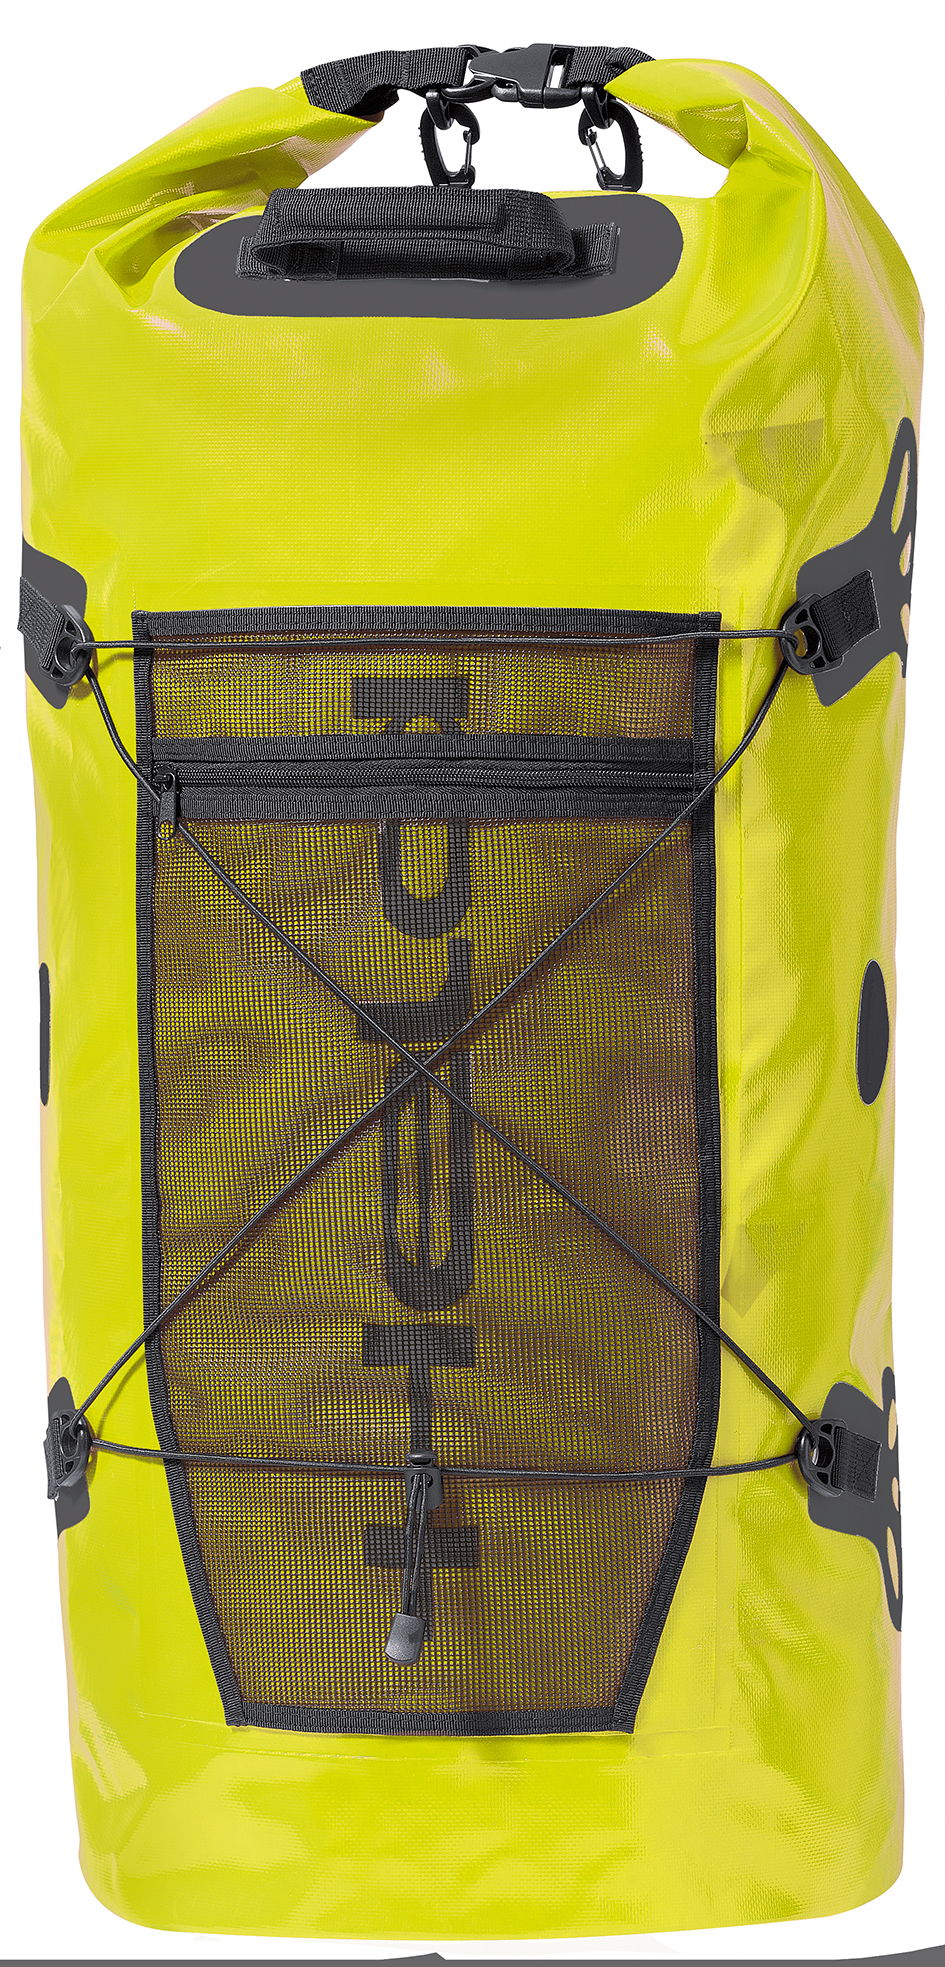 Held Waterproof Motorcycle Tail Roll Bag Yellow - http ...